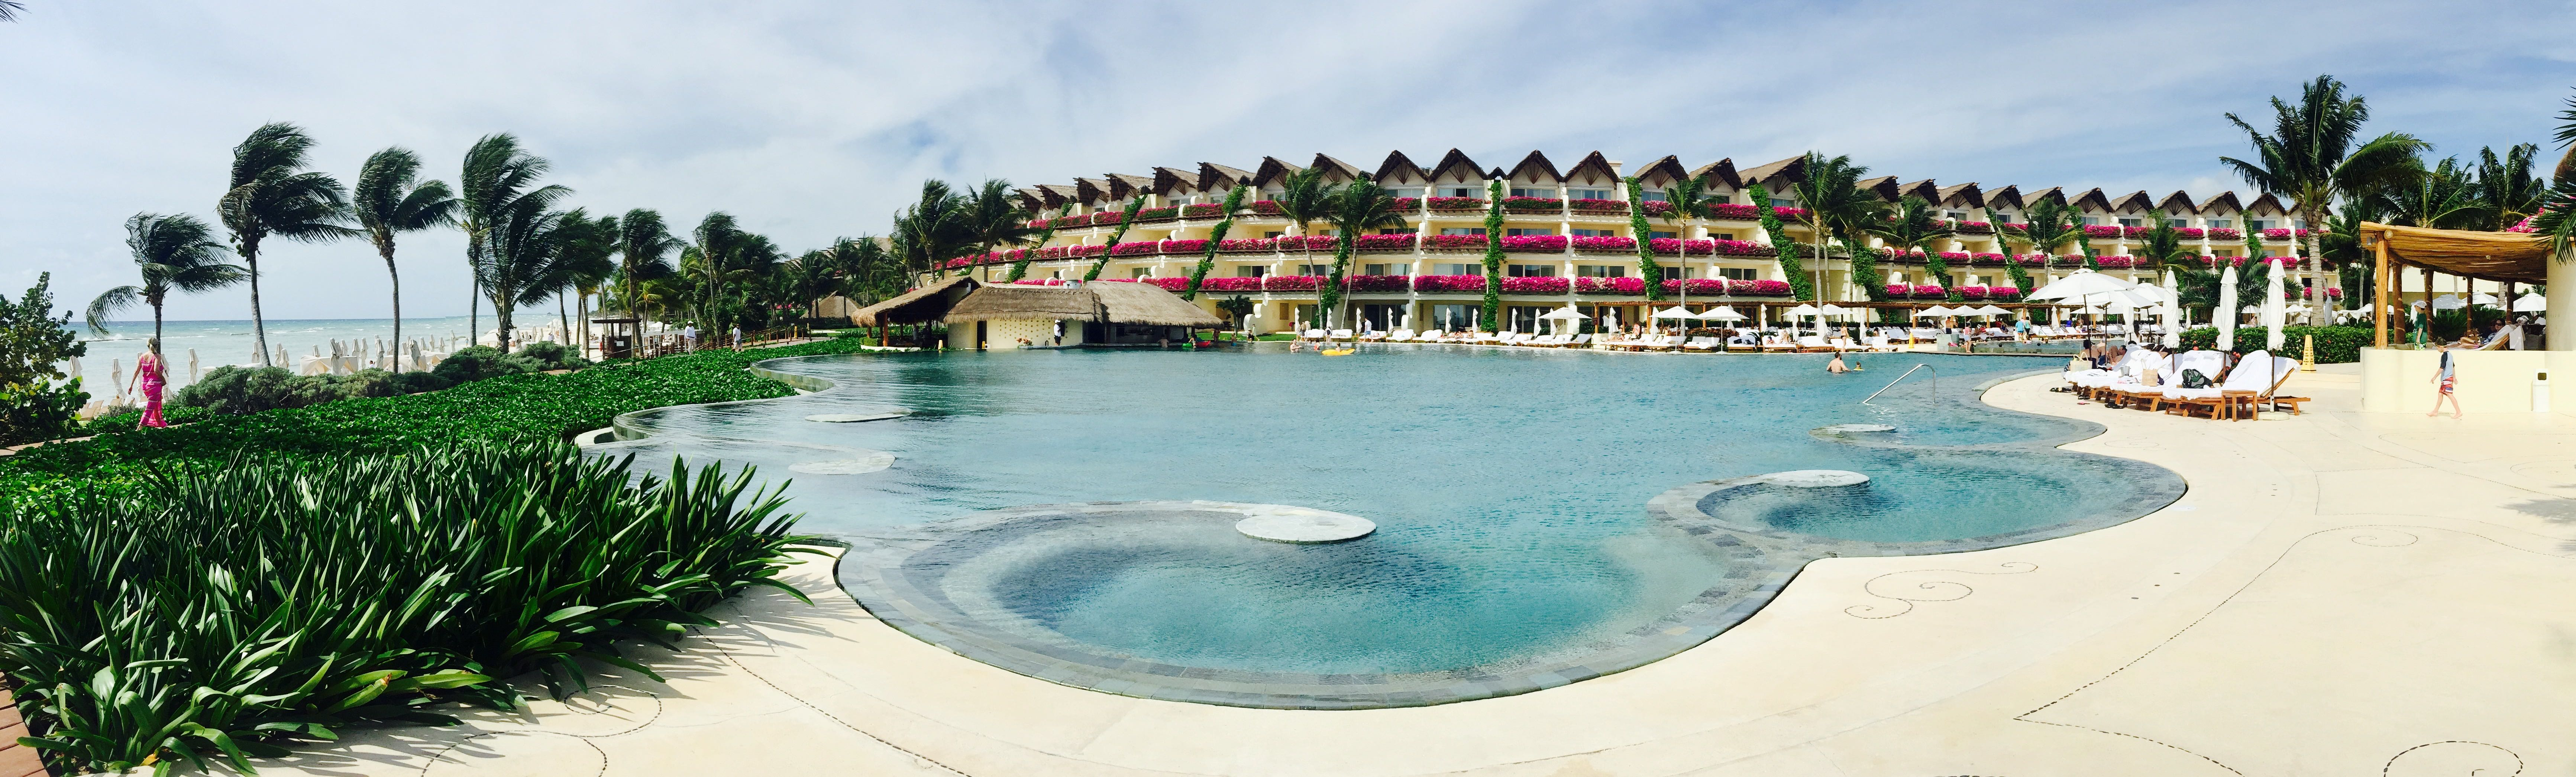 Grand Velas_Ambassador Pool